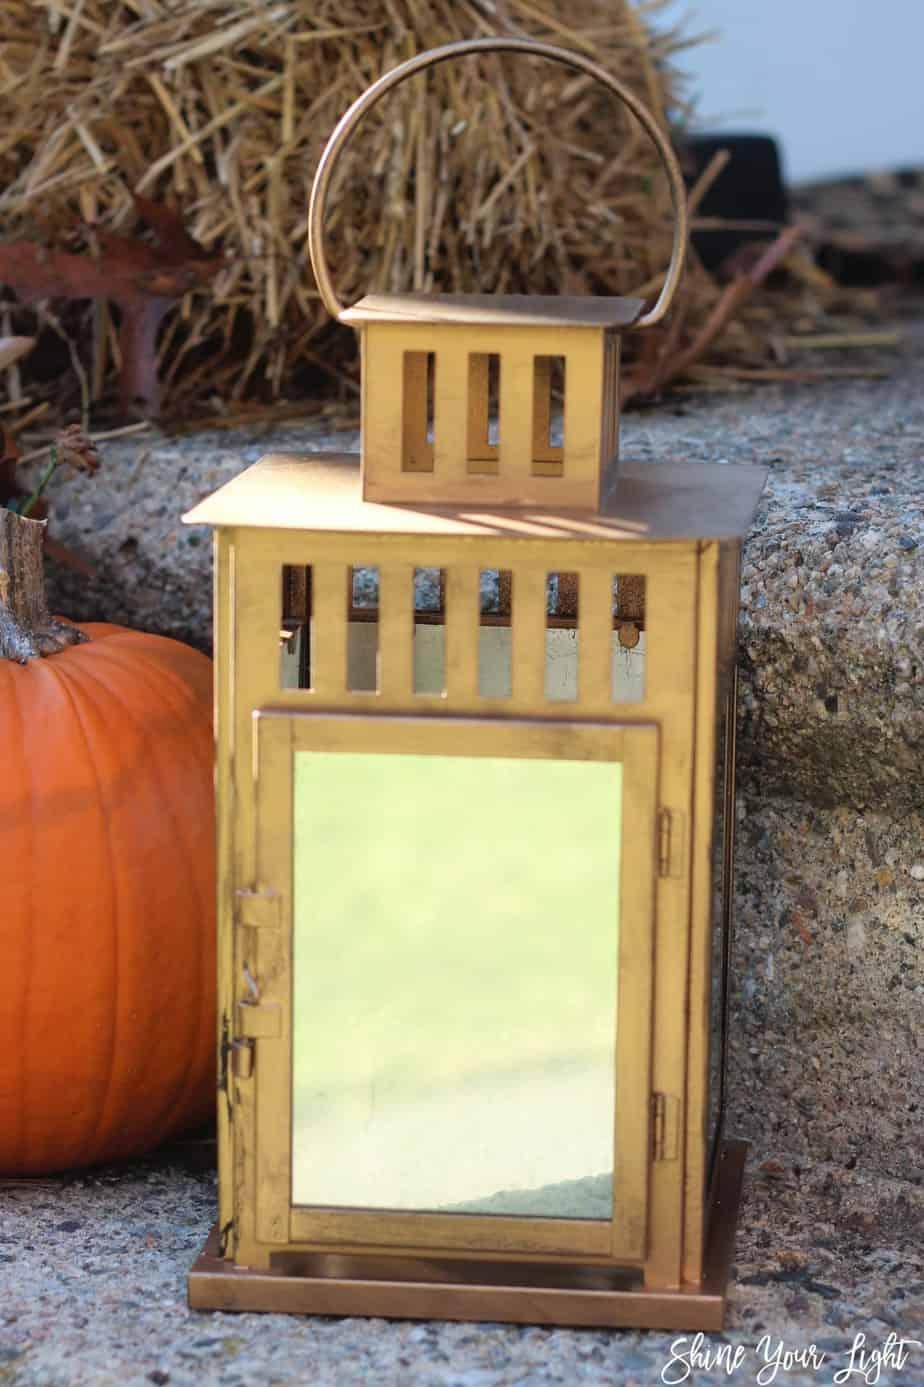 Diy Mirrored Lantern An Ikea Hack Shine Your Light